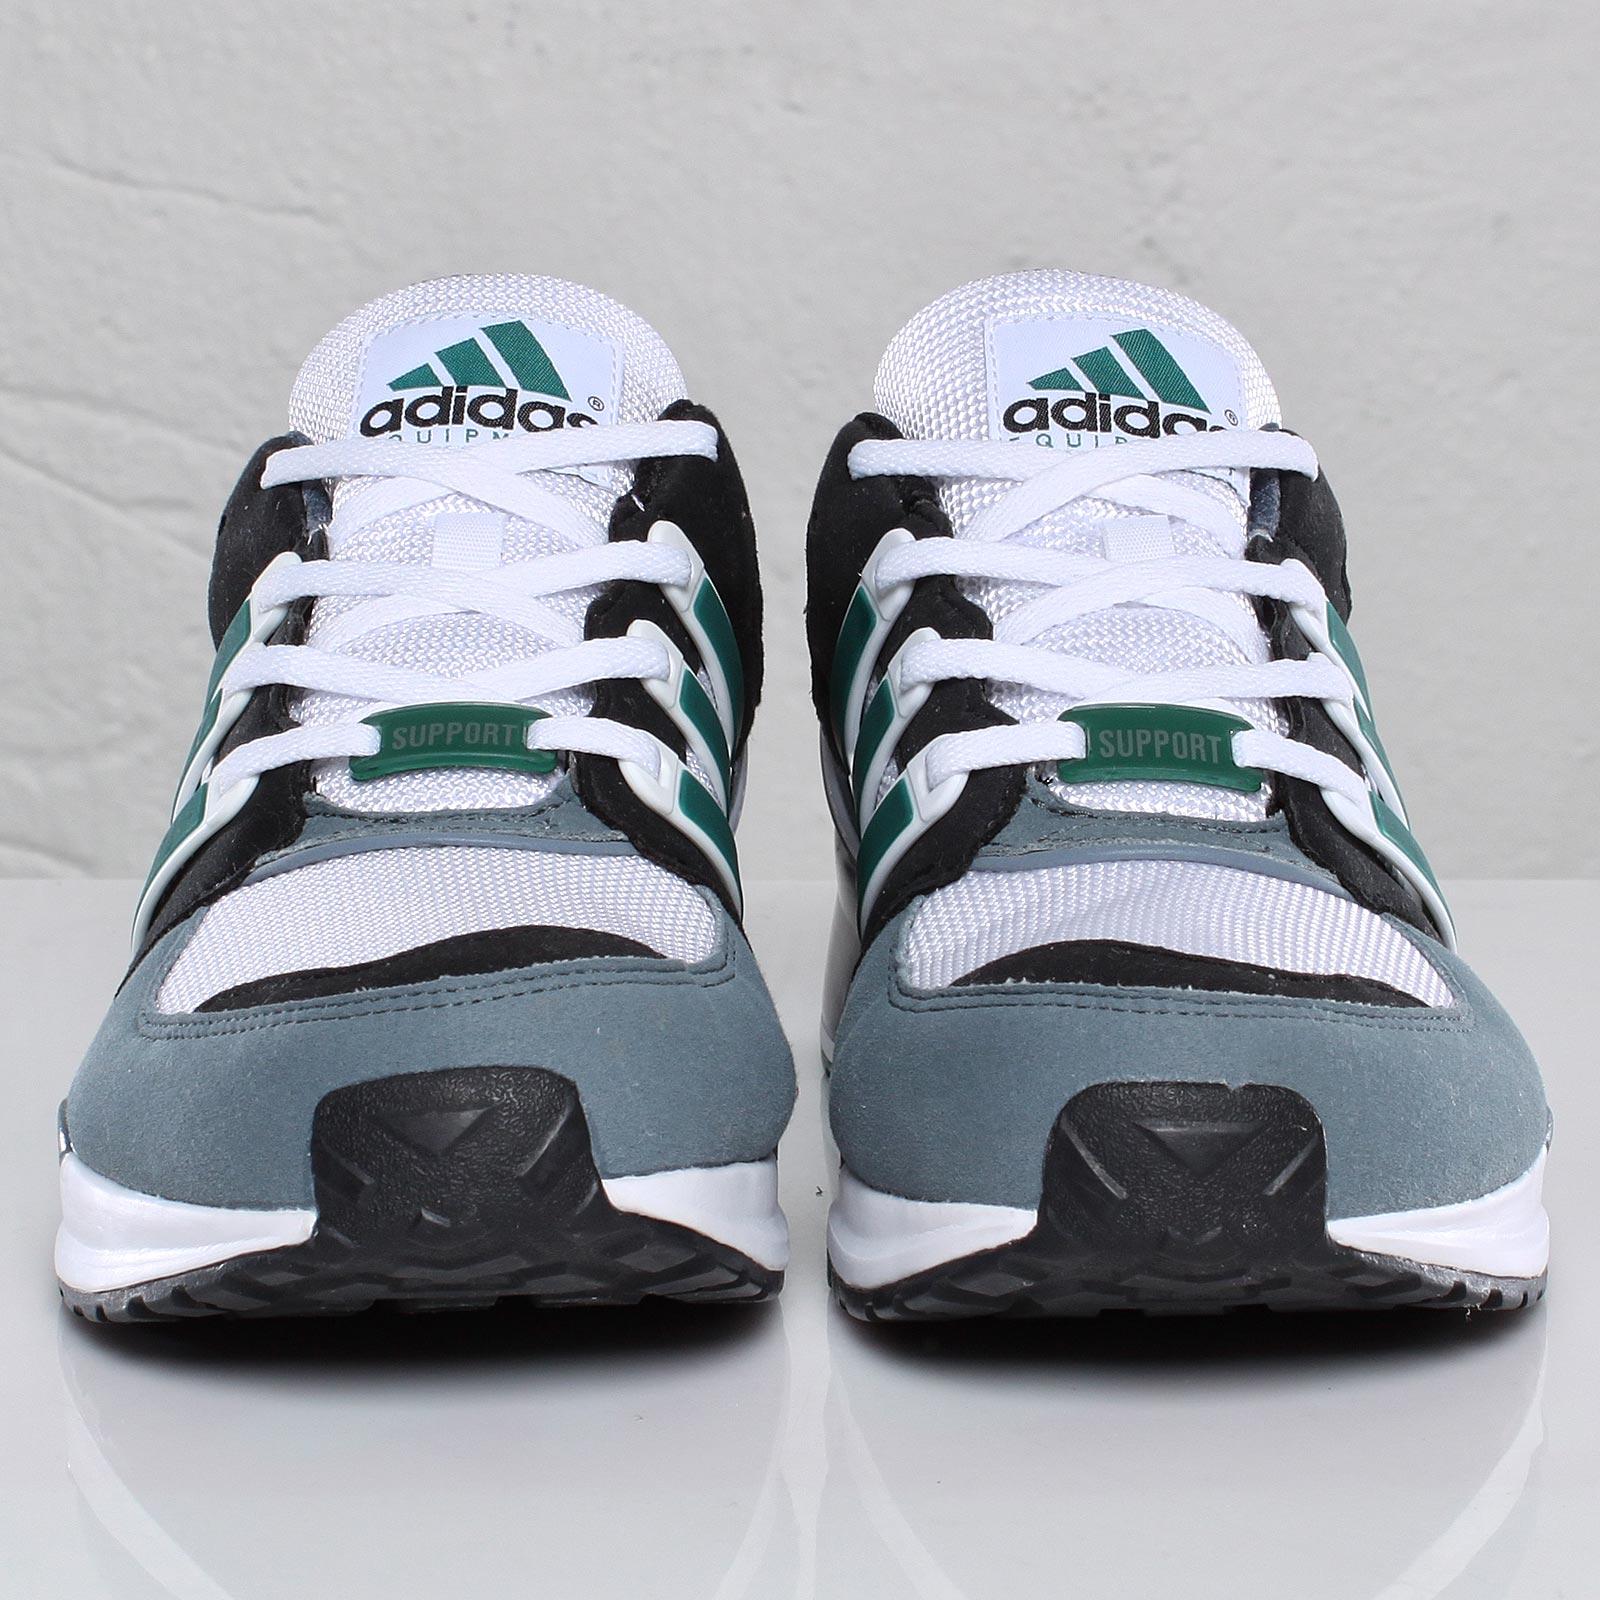 adidas eqt support running